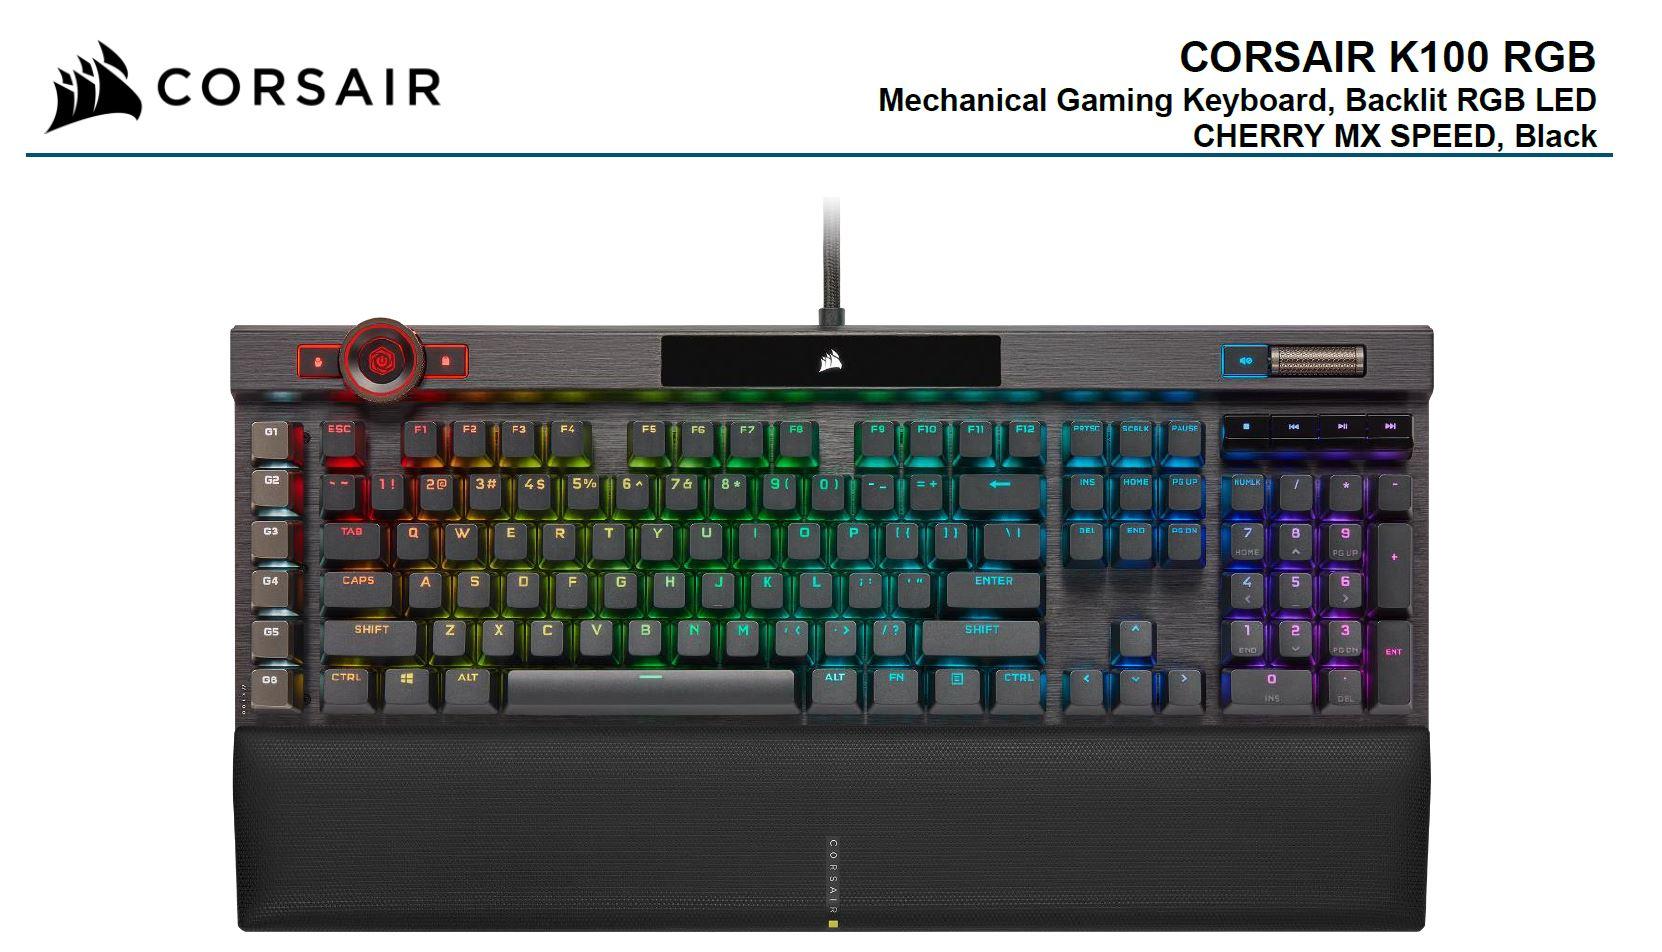 Corsair, K100, RGB, Cherry, MX, SPEED, AXON, 44-Zone, RGB, PBT, Double-Shot, Keycaps, Black, Mechanical, Gaming, Keyboard,